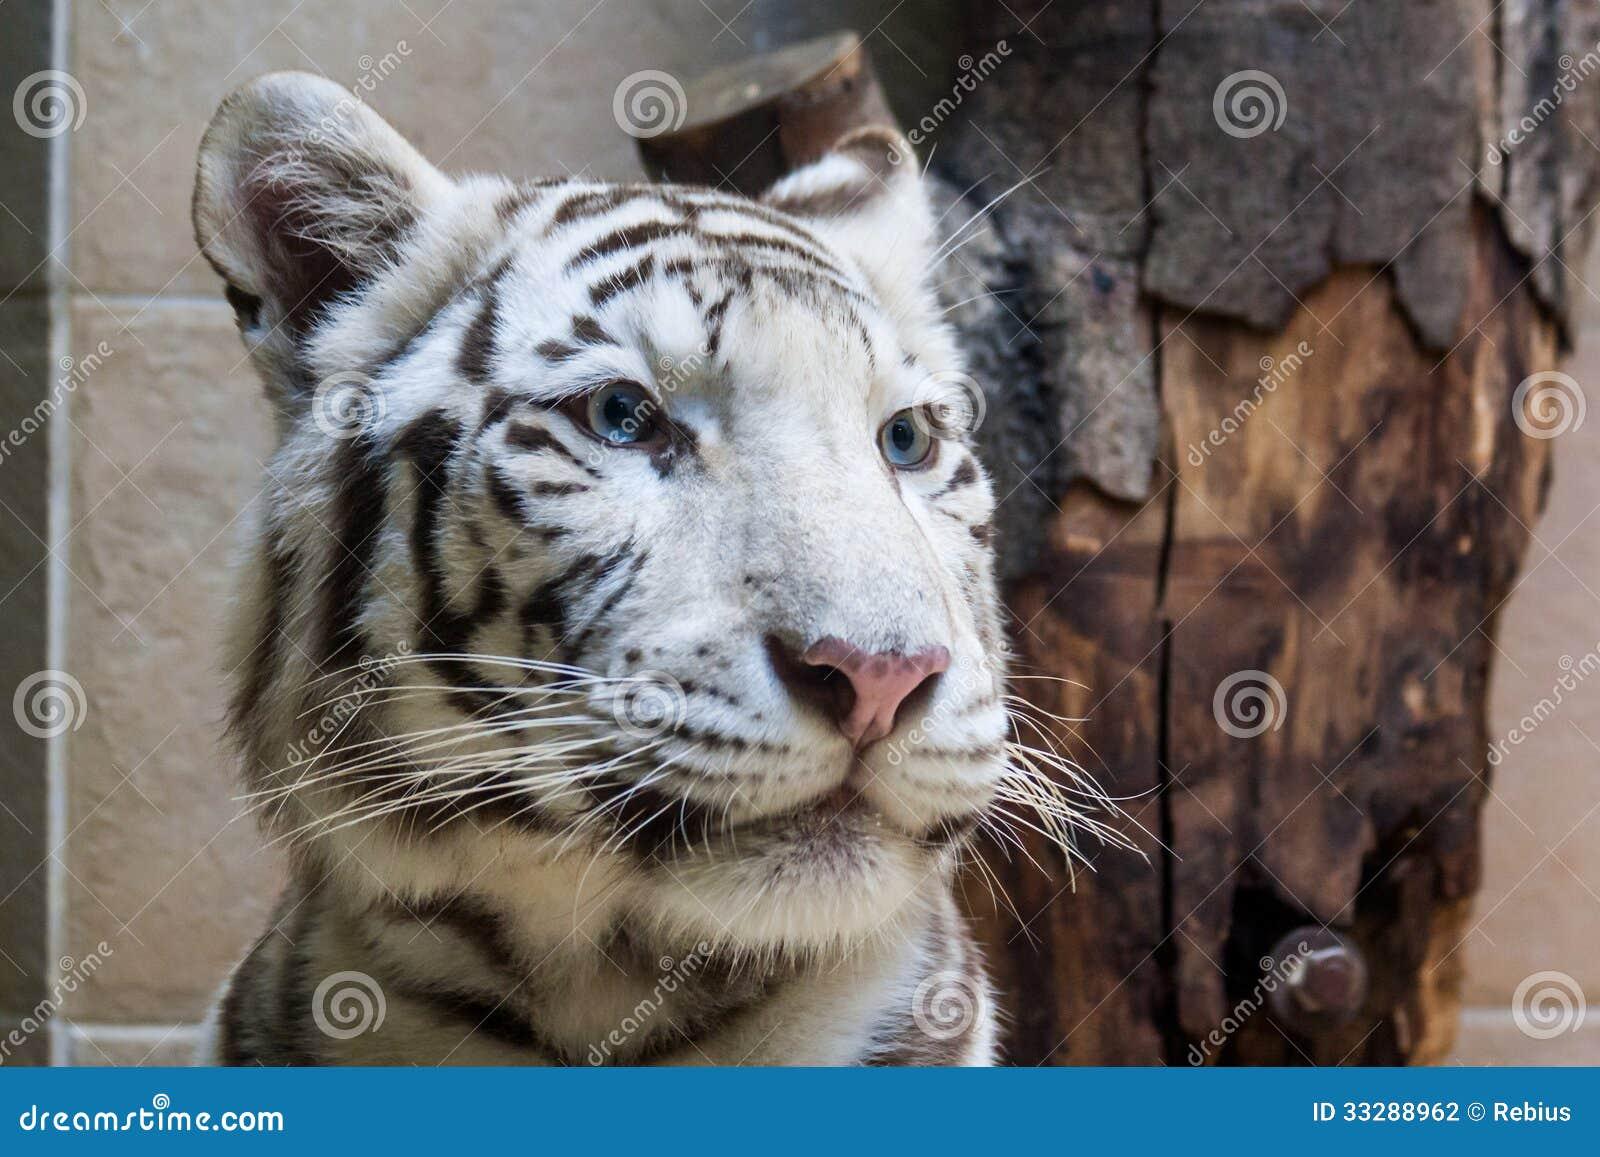 White Tiger Face Blue Eyes